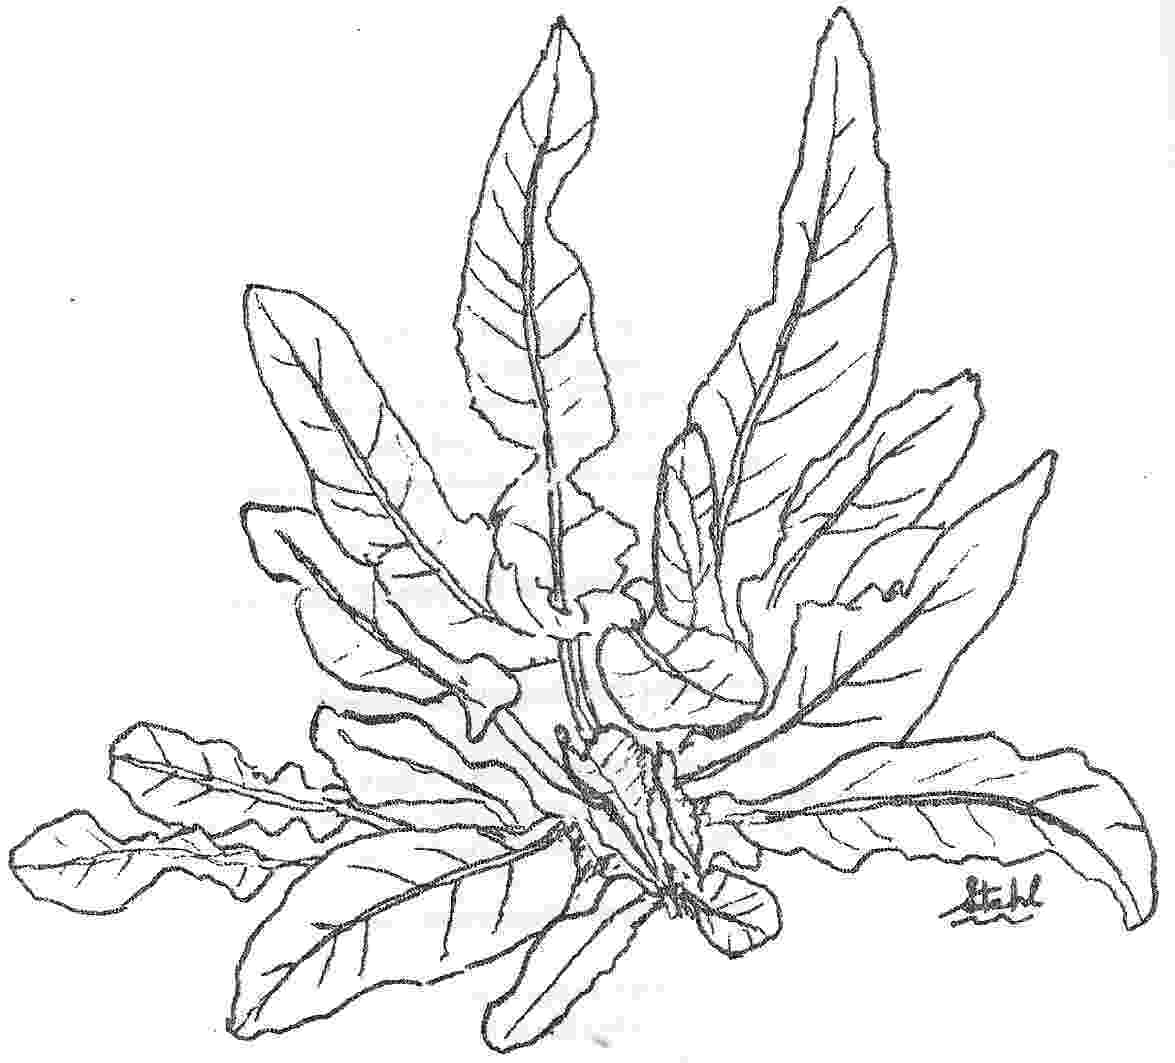 ocean plants coloring pages seaweed coloring pages getcoloringpagescom pages ocean coloring plants